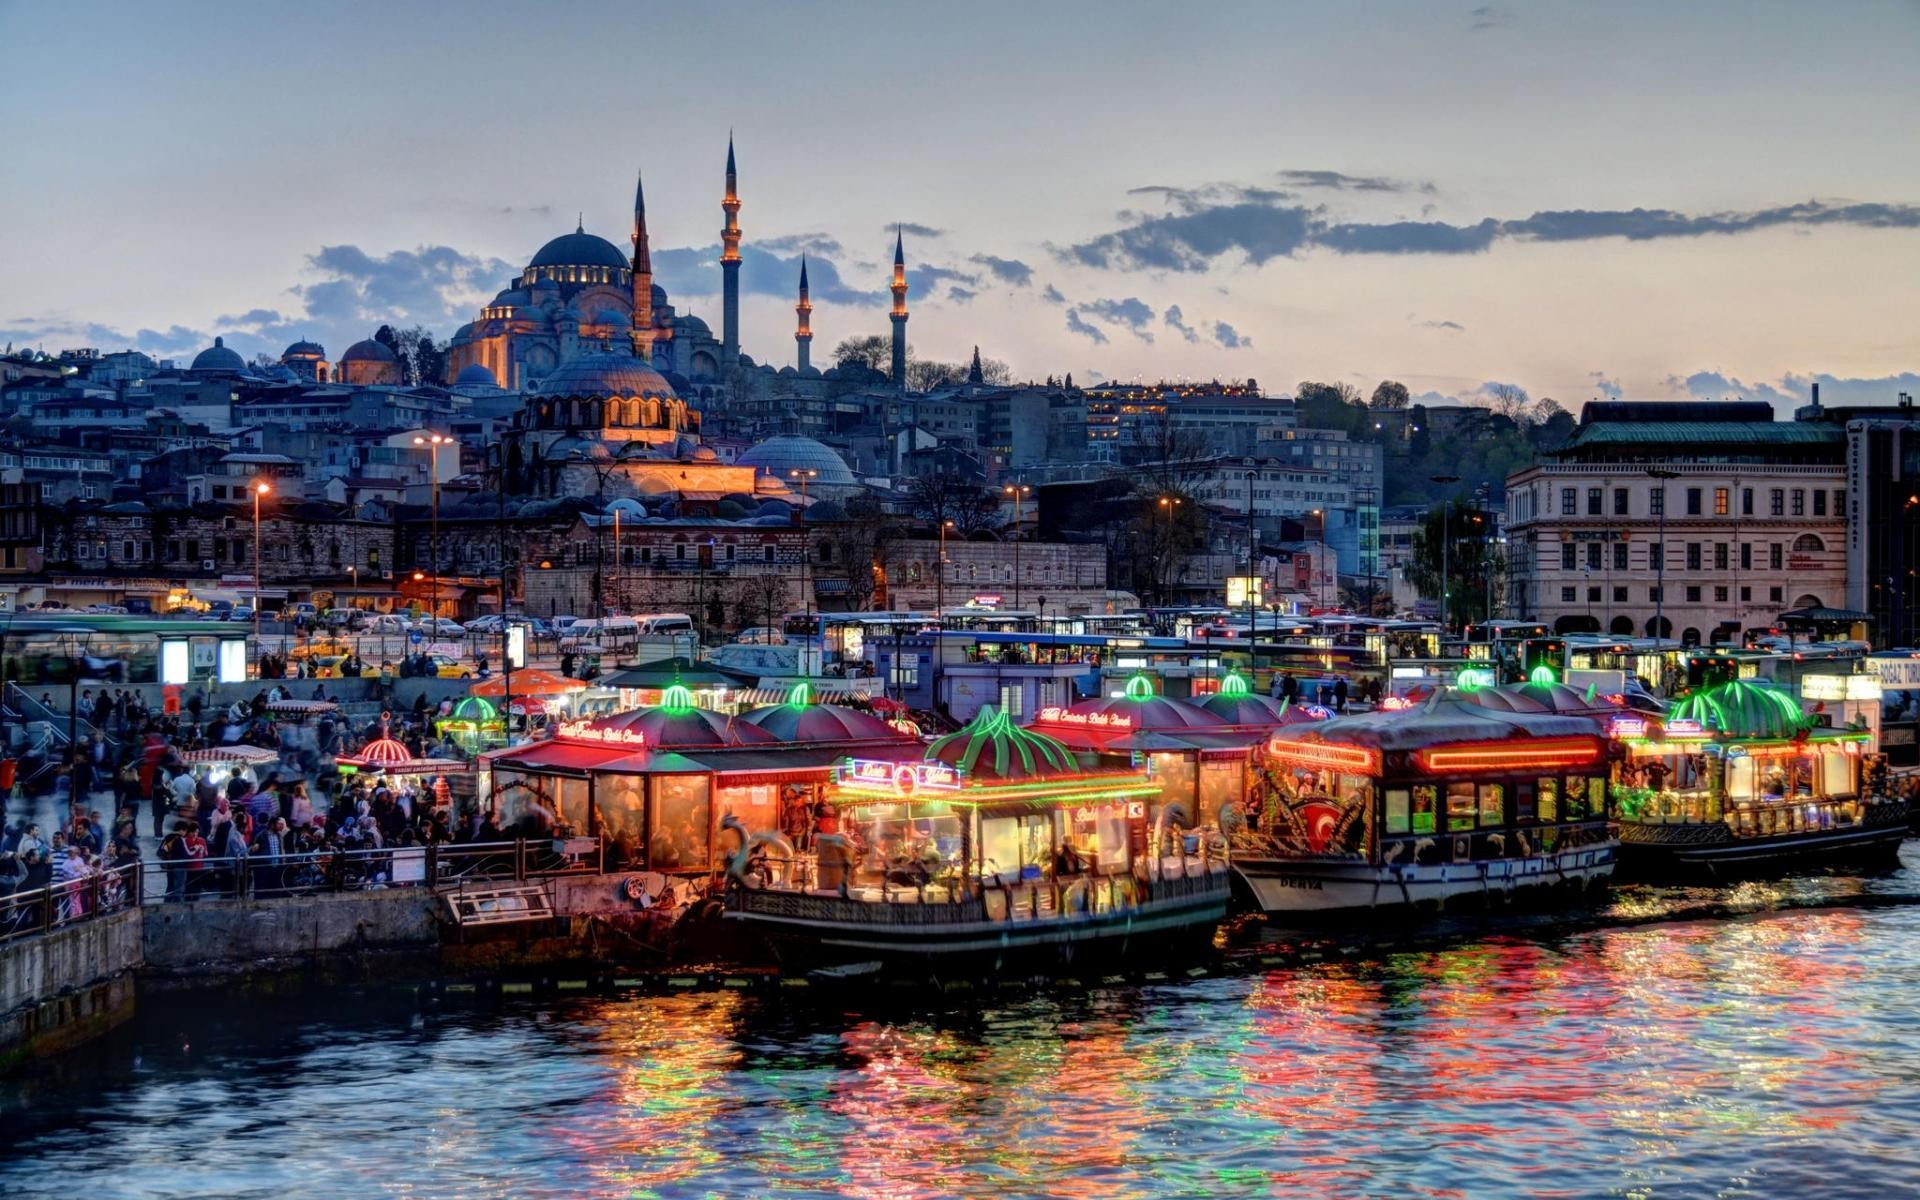 ISTANBUL - PUTOVANJE AVIONOM - USKRS - PRVI MAJ CENE